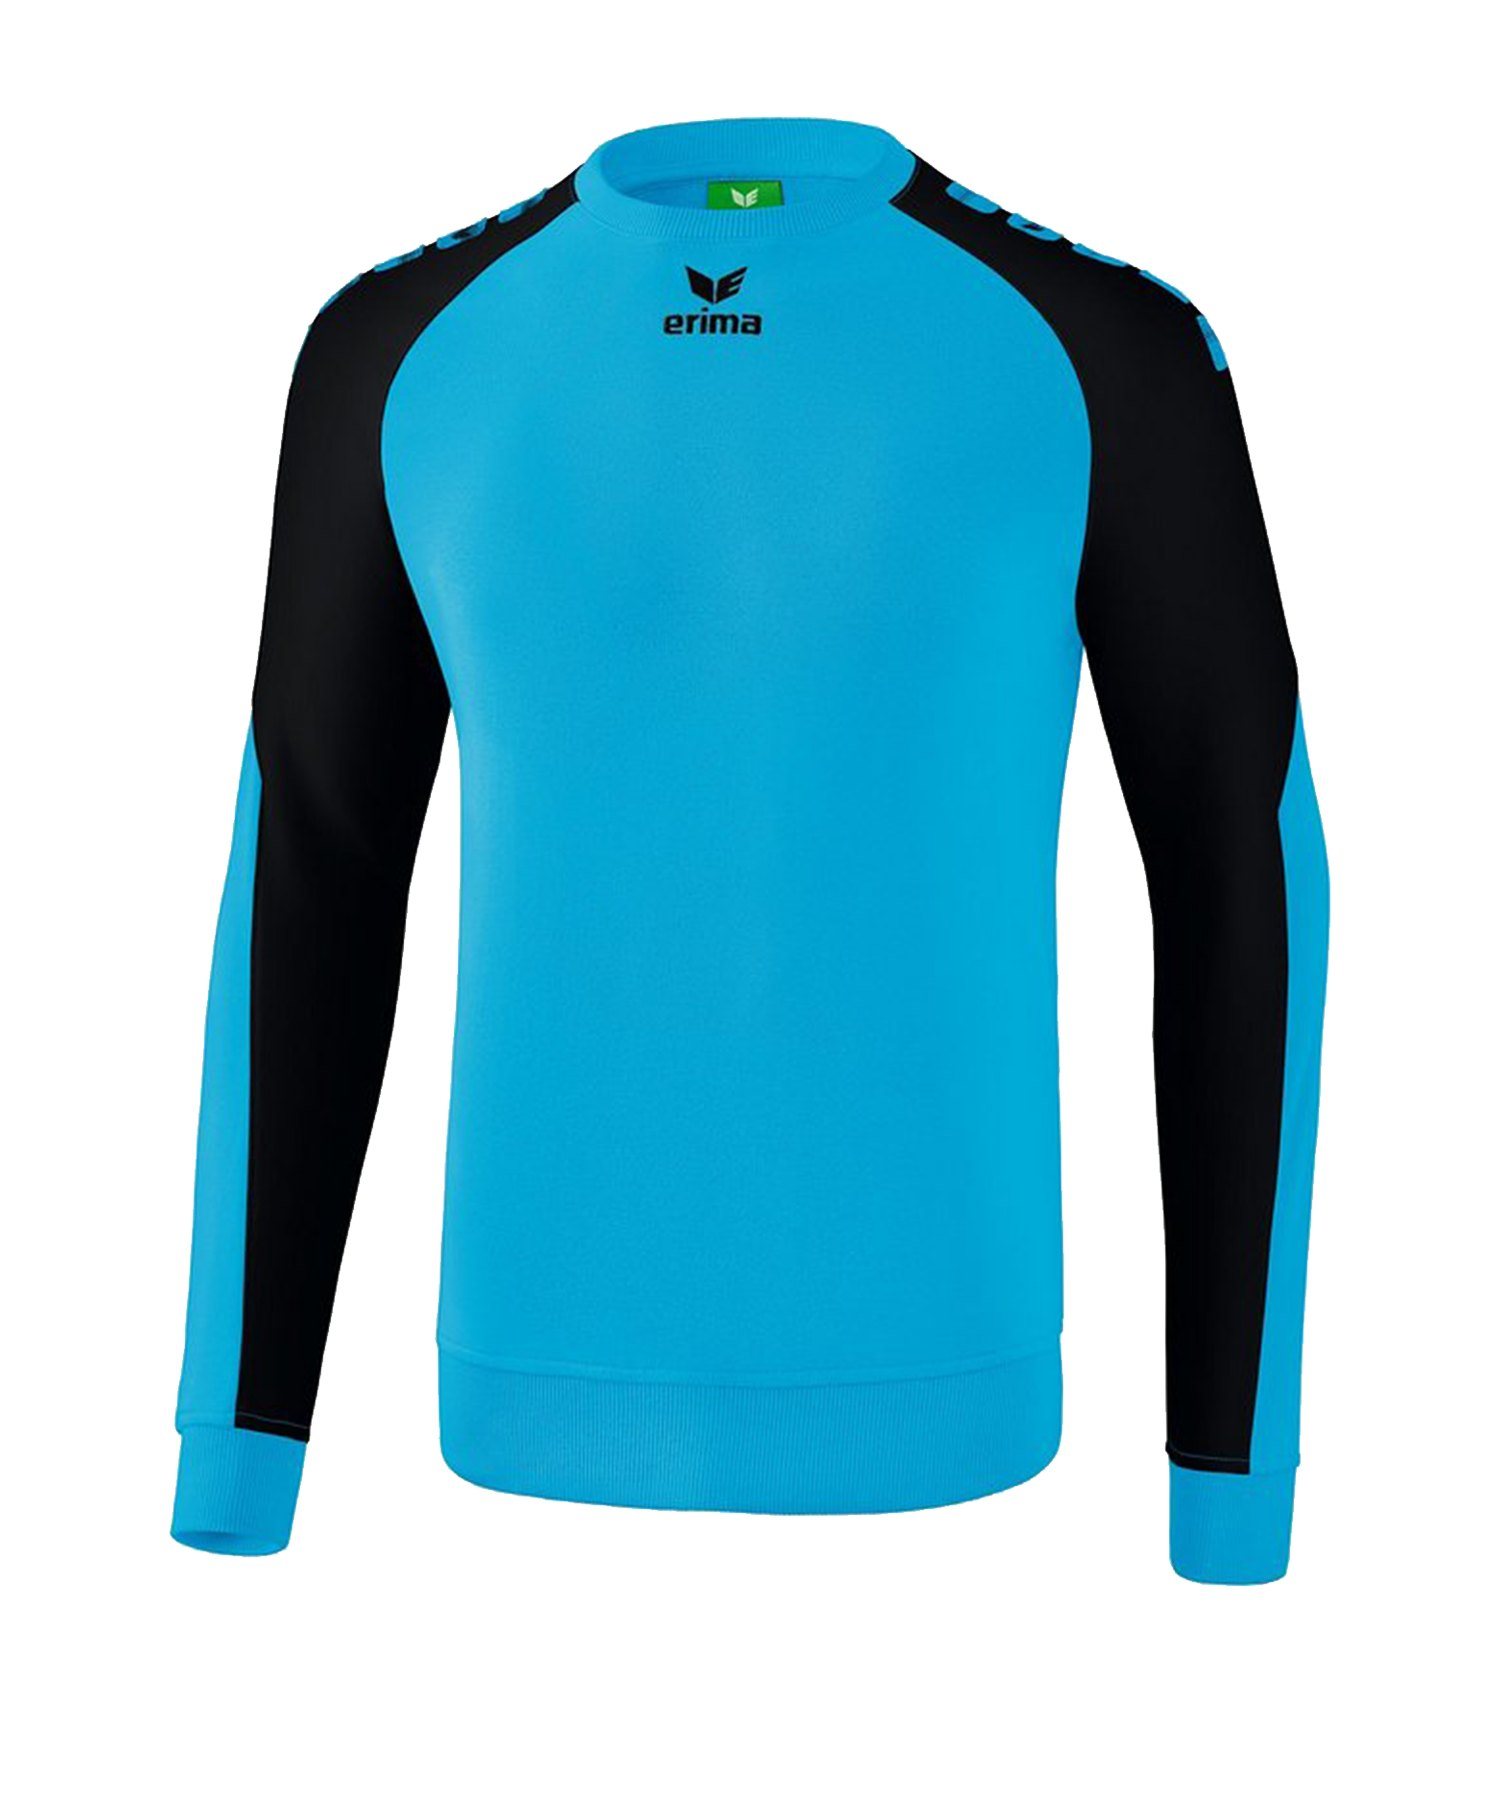 Erima Essential 5-C Sweatshirt Kids Blau Schwarz - Blau